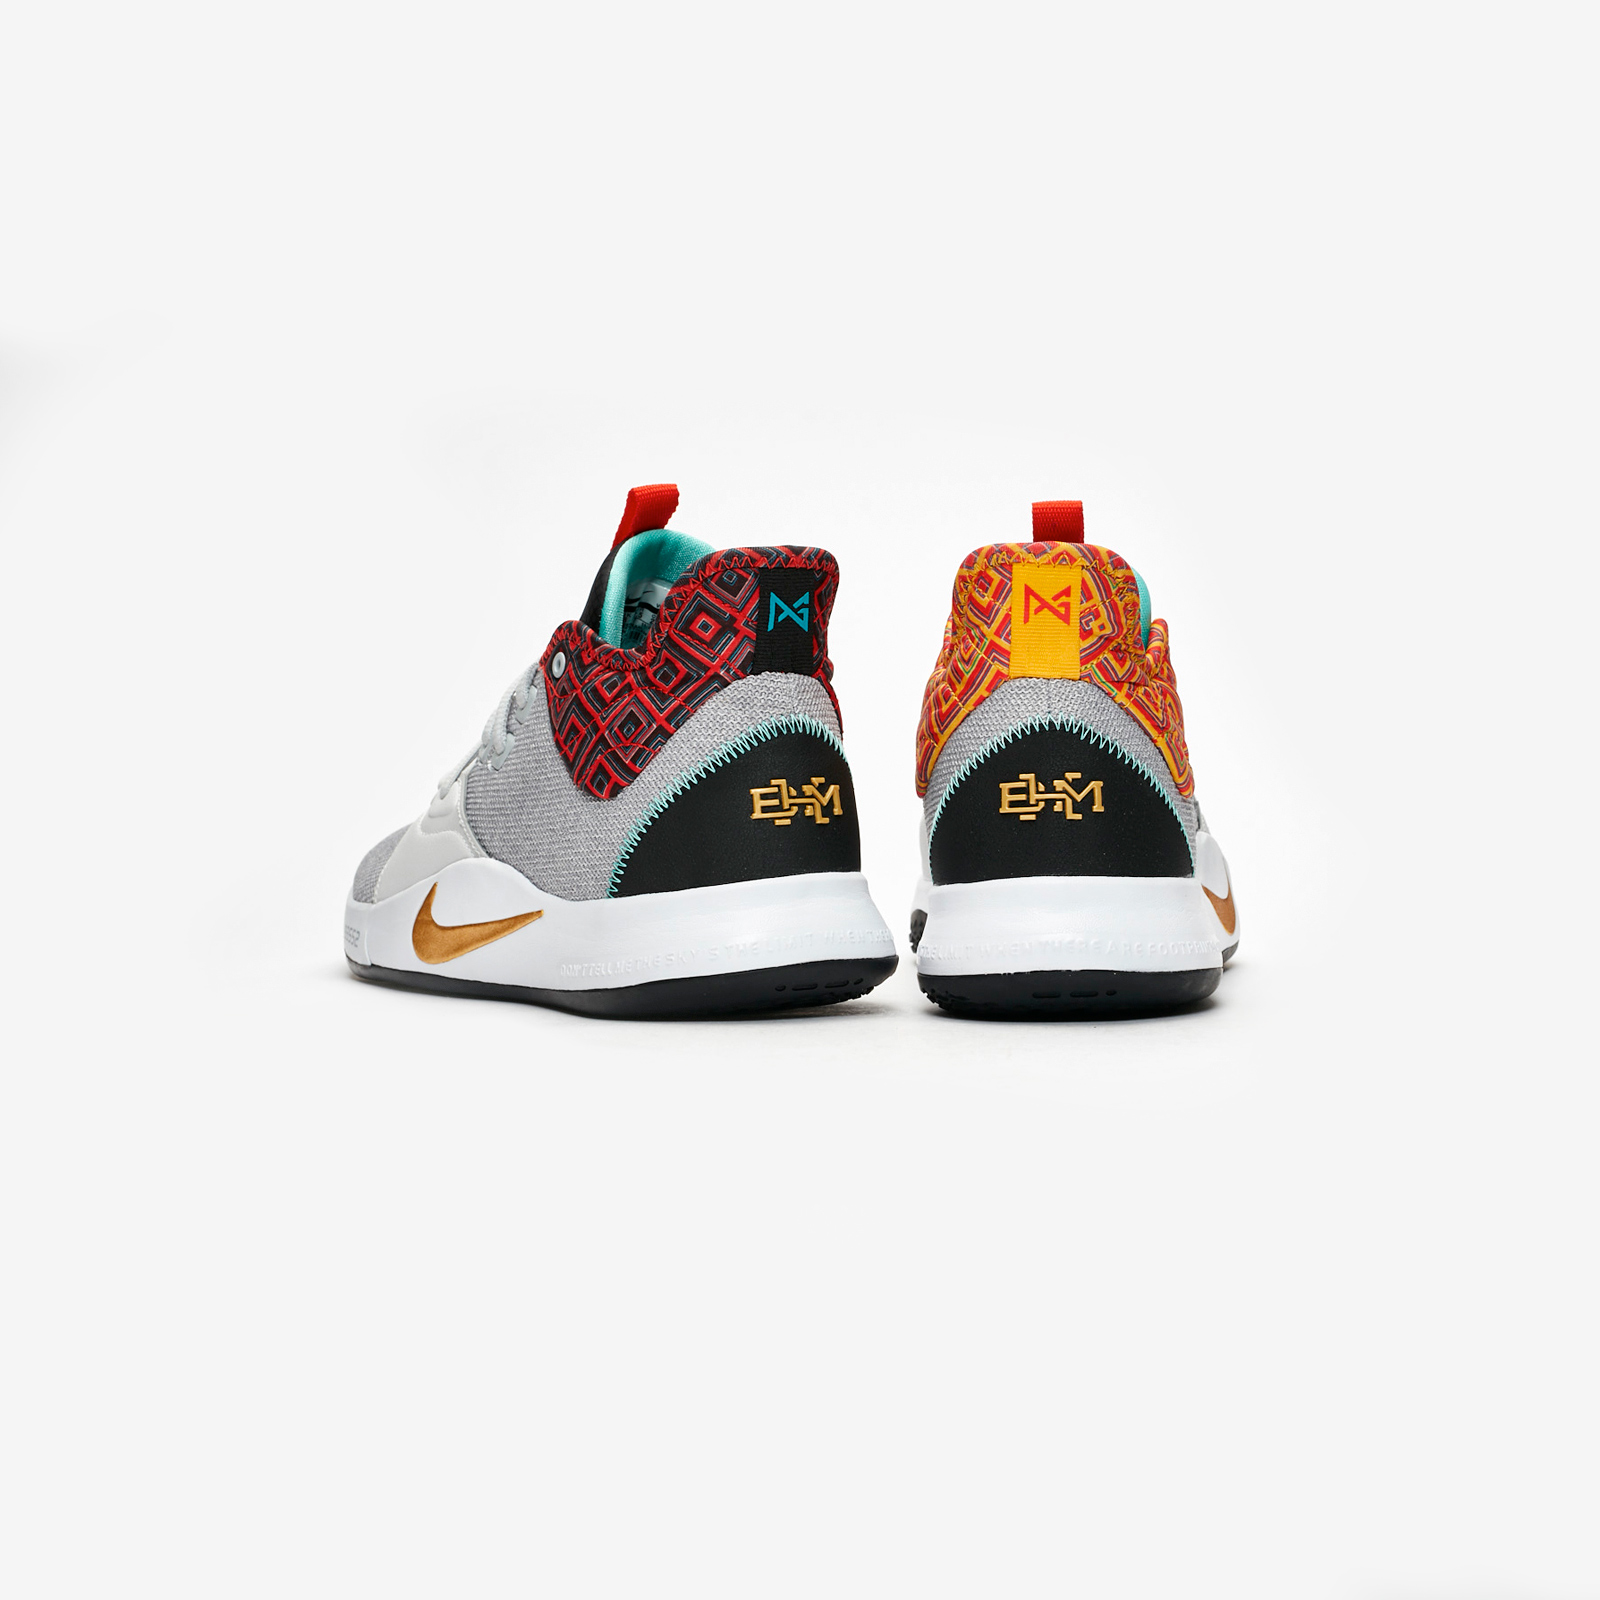 15a5a02b56ac Nike PG 3 BHM - Bq6242-007 - Sneakersnstuff